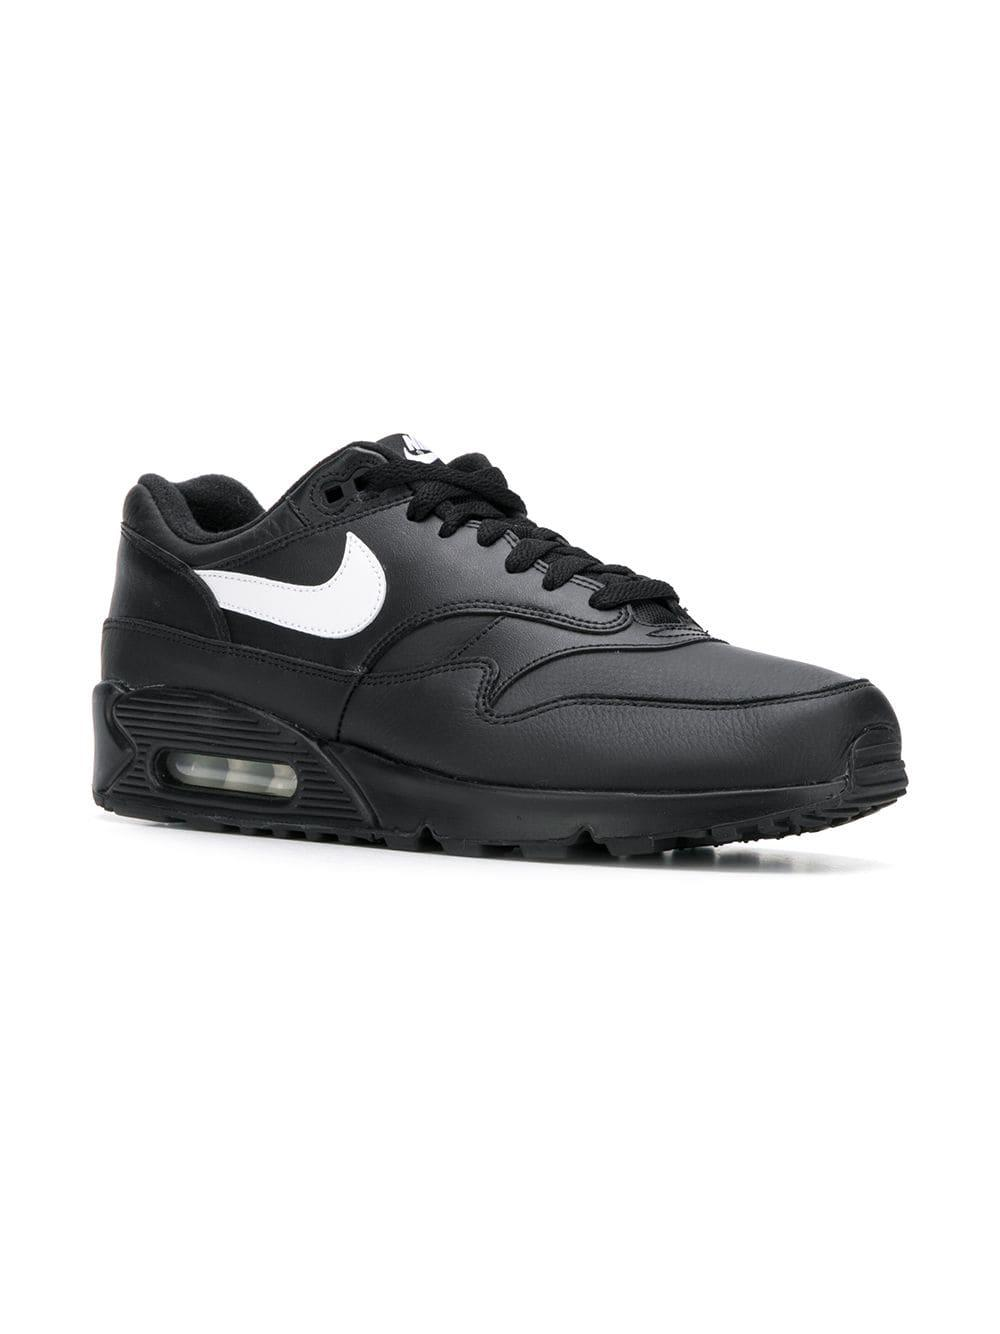 a1b3552c515 Lyst - Nike Air Max 90 1 Sneakers in Black for Men